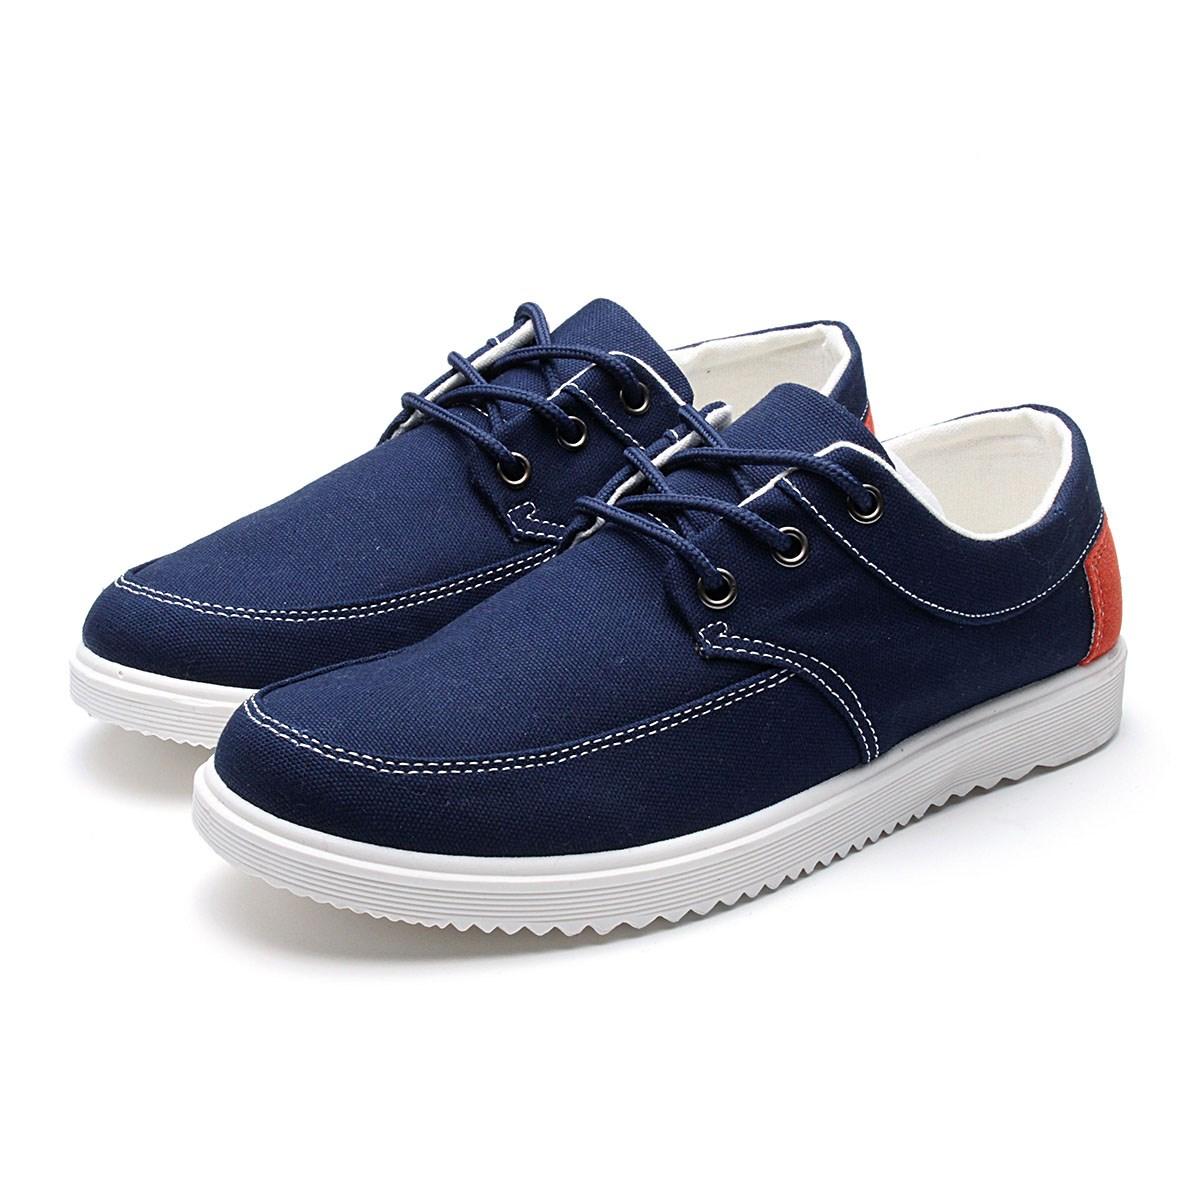 canvas casual flats low top shoes mens flat shoes